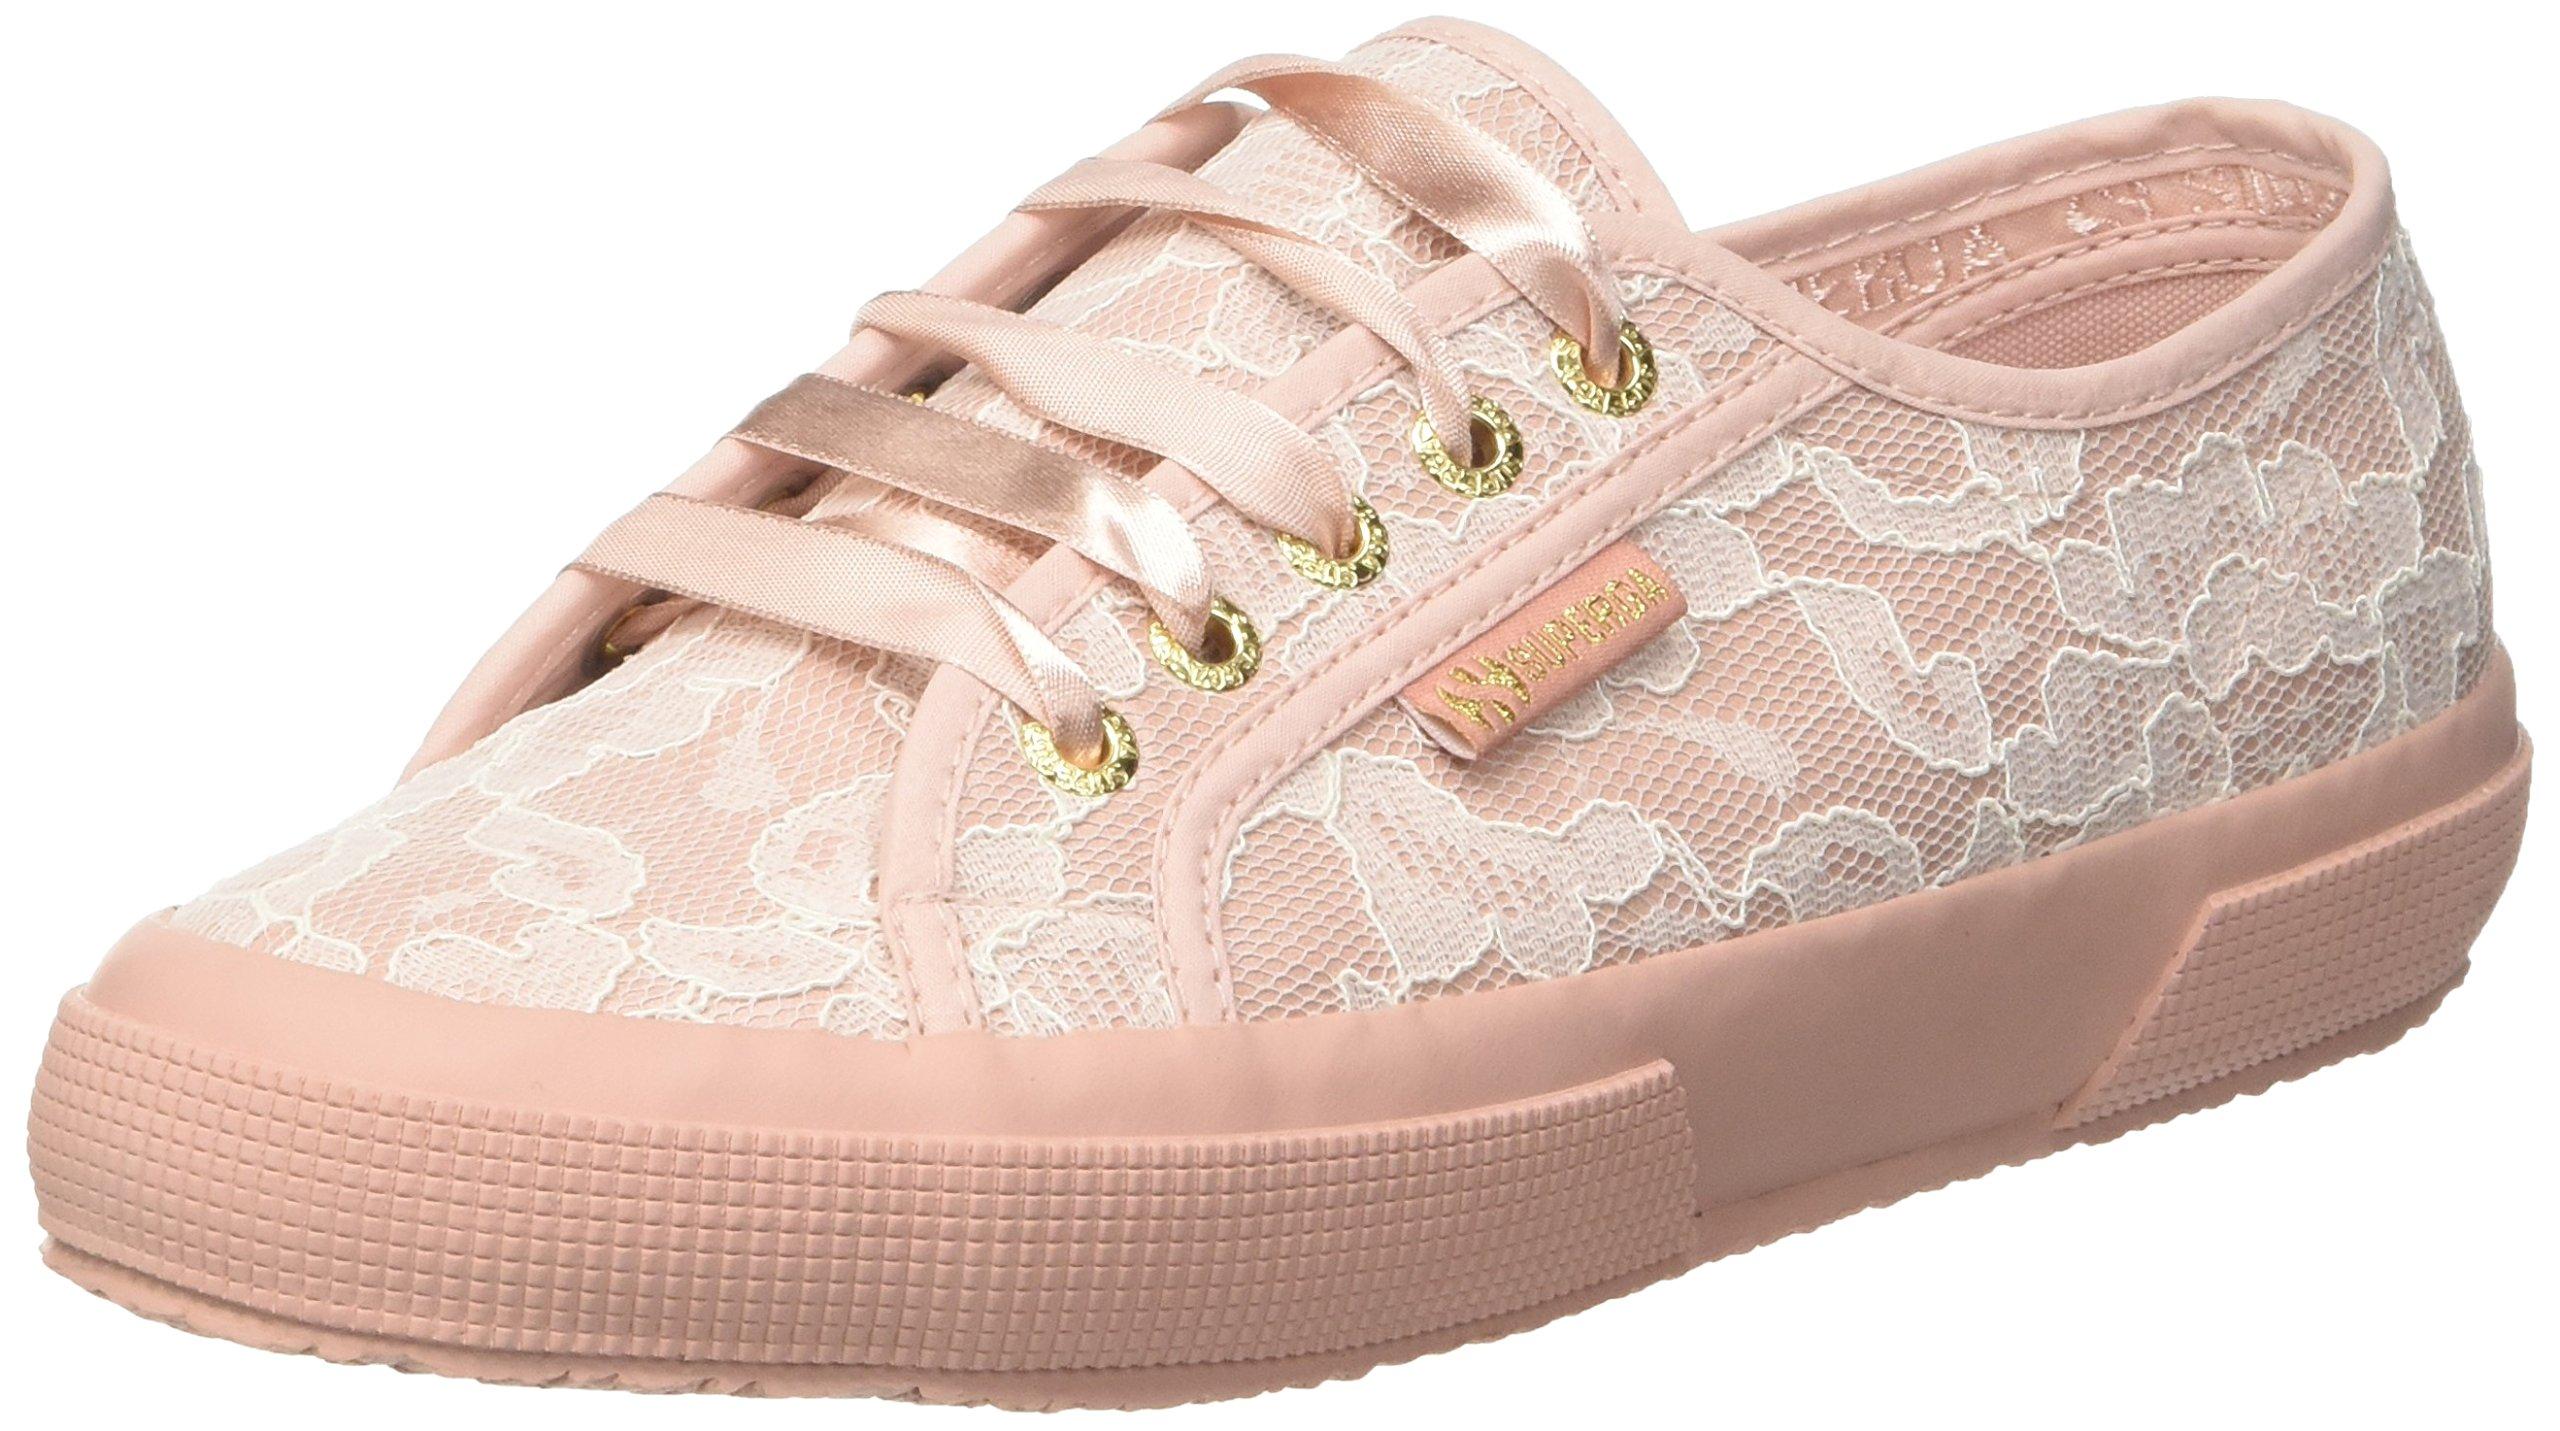 synlealacewBaskets Superga Rose 91738 2750 Eu white Lace FemmeMulticolorepink QrdoxECBeW